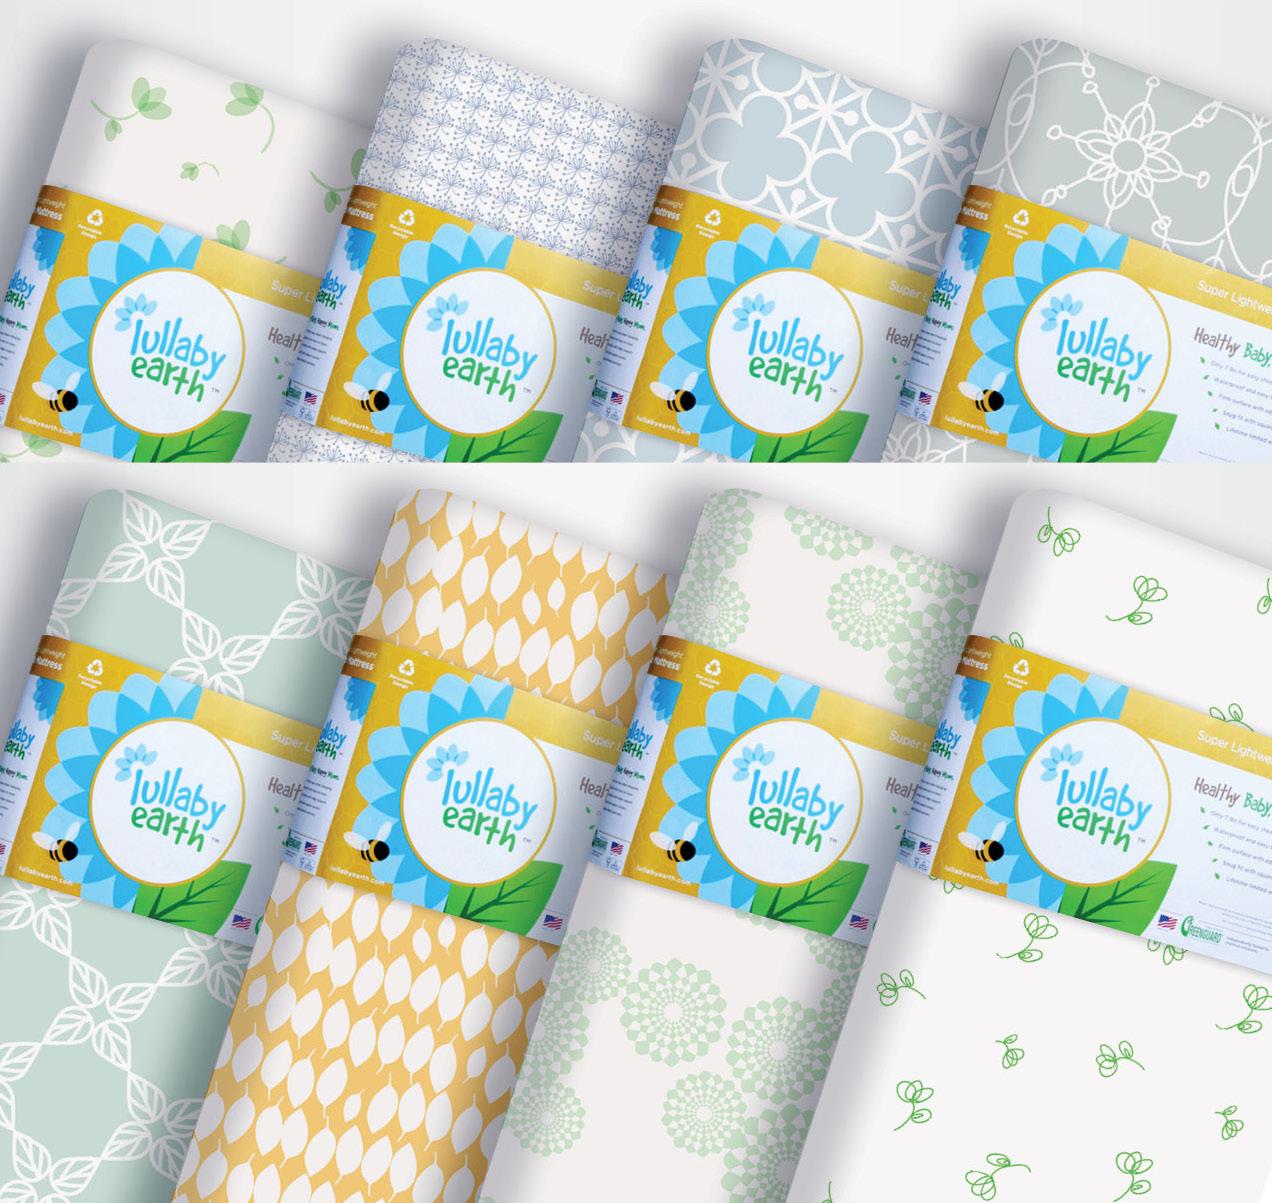 Product Development for Naturepedic / Organic Crib Mattresses